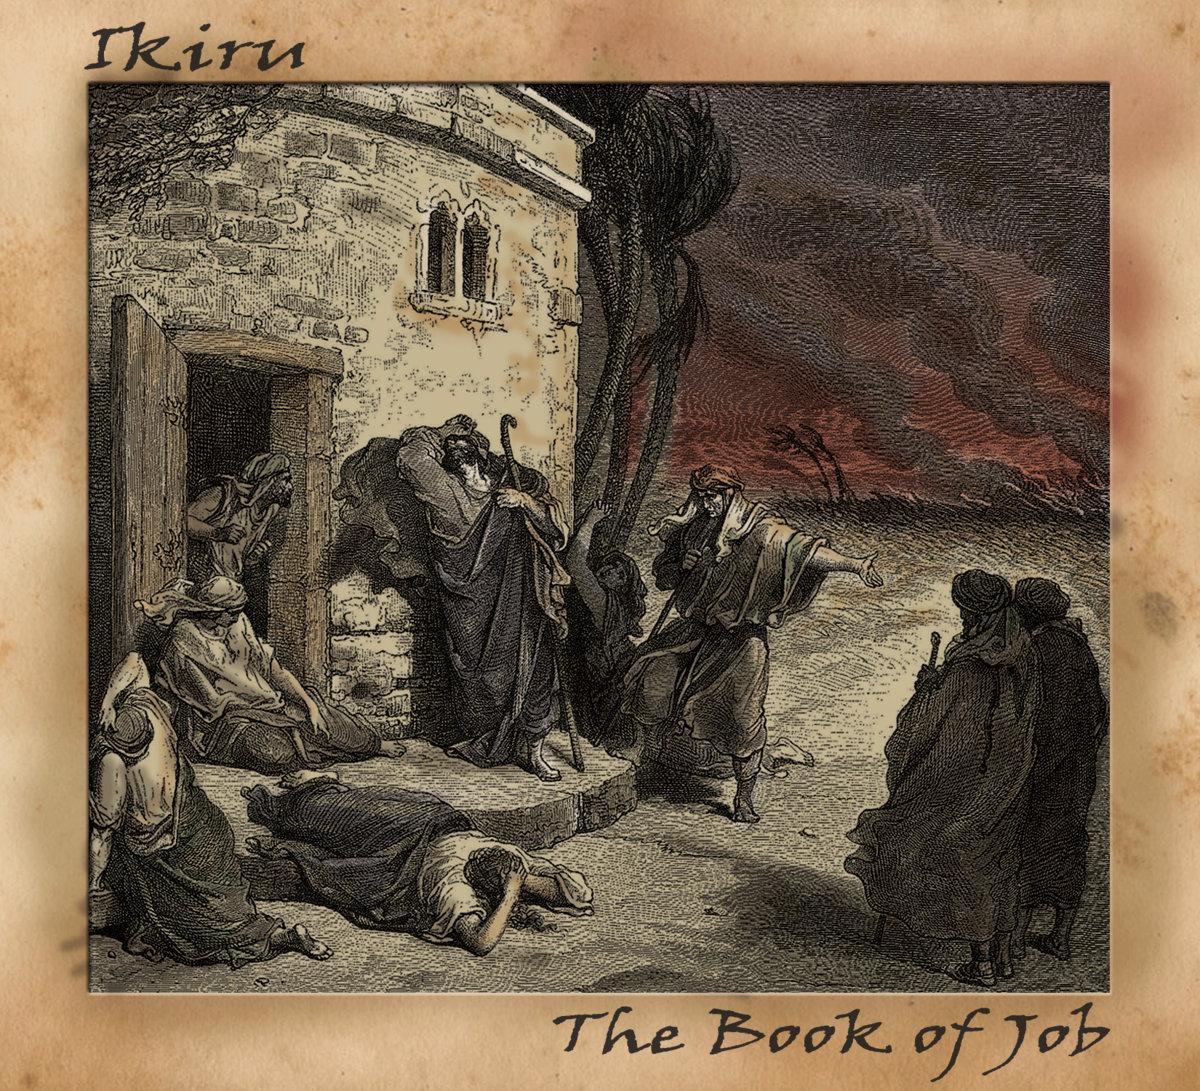 Book Cover Artist Jobs ~ The book of job ikiru